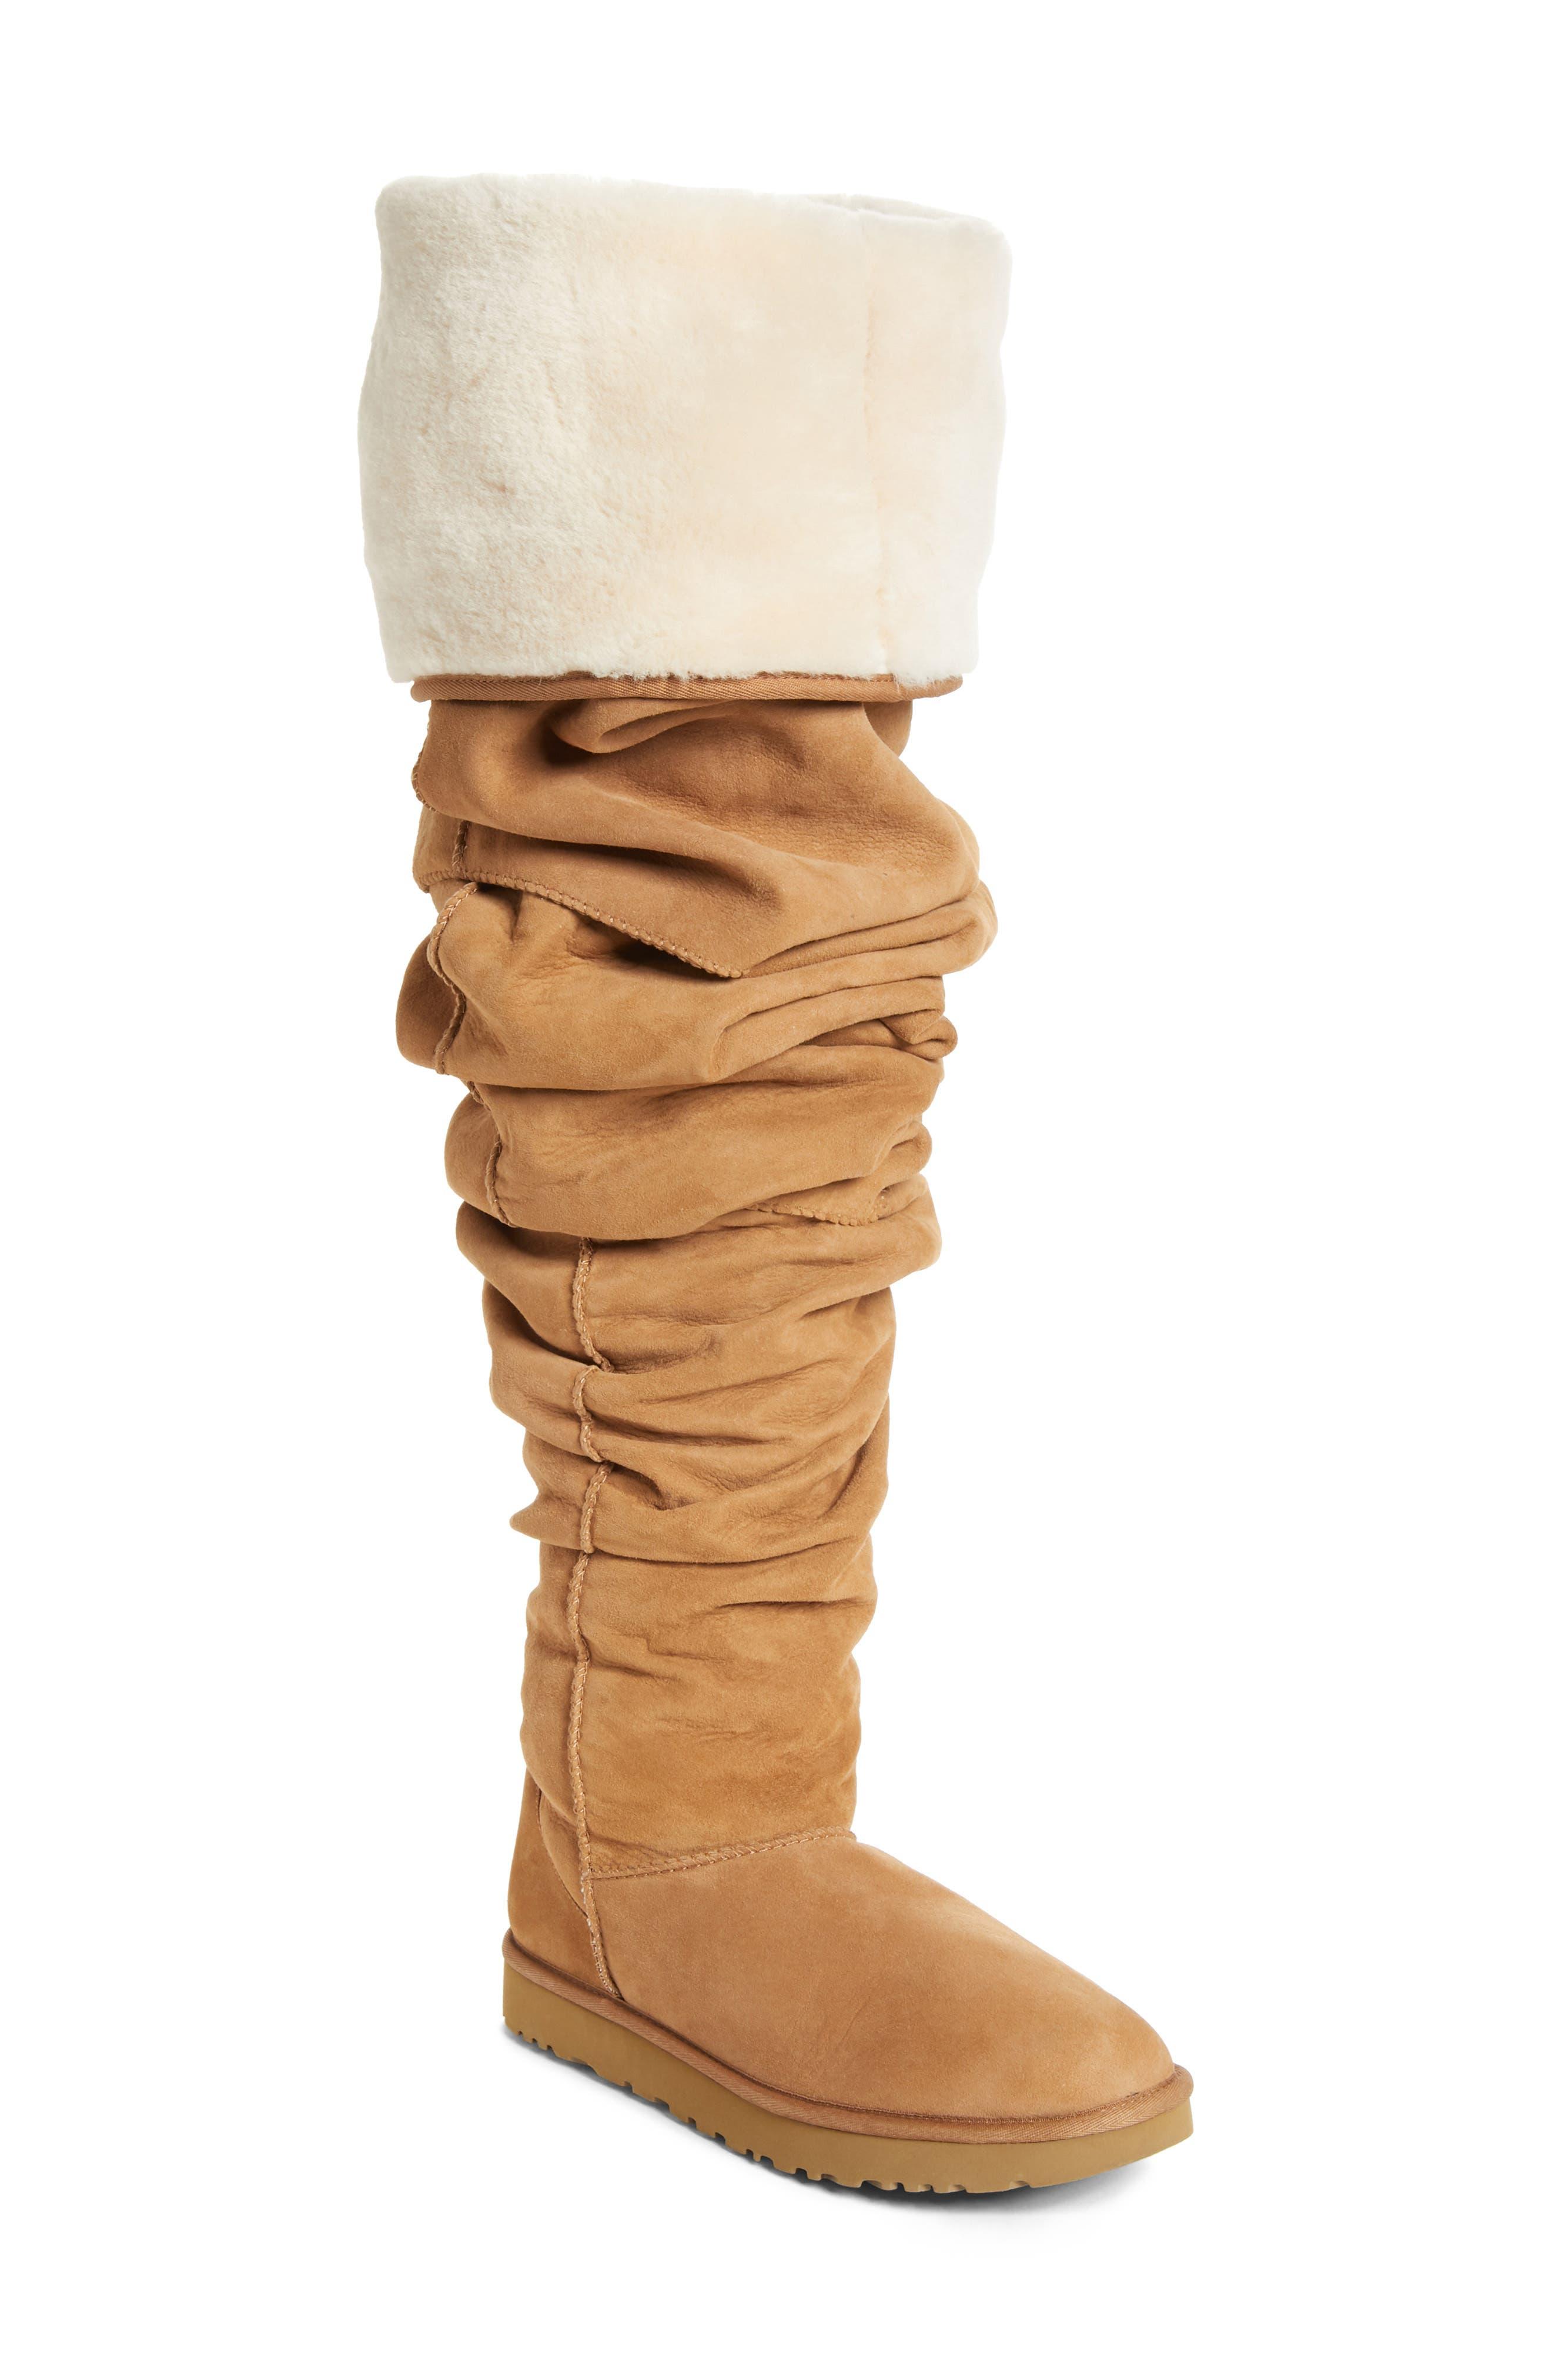 x UGG<sup>®</sup> Thigh High Boot,                             Main thumbnail 1, color,                             BROWN